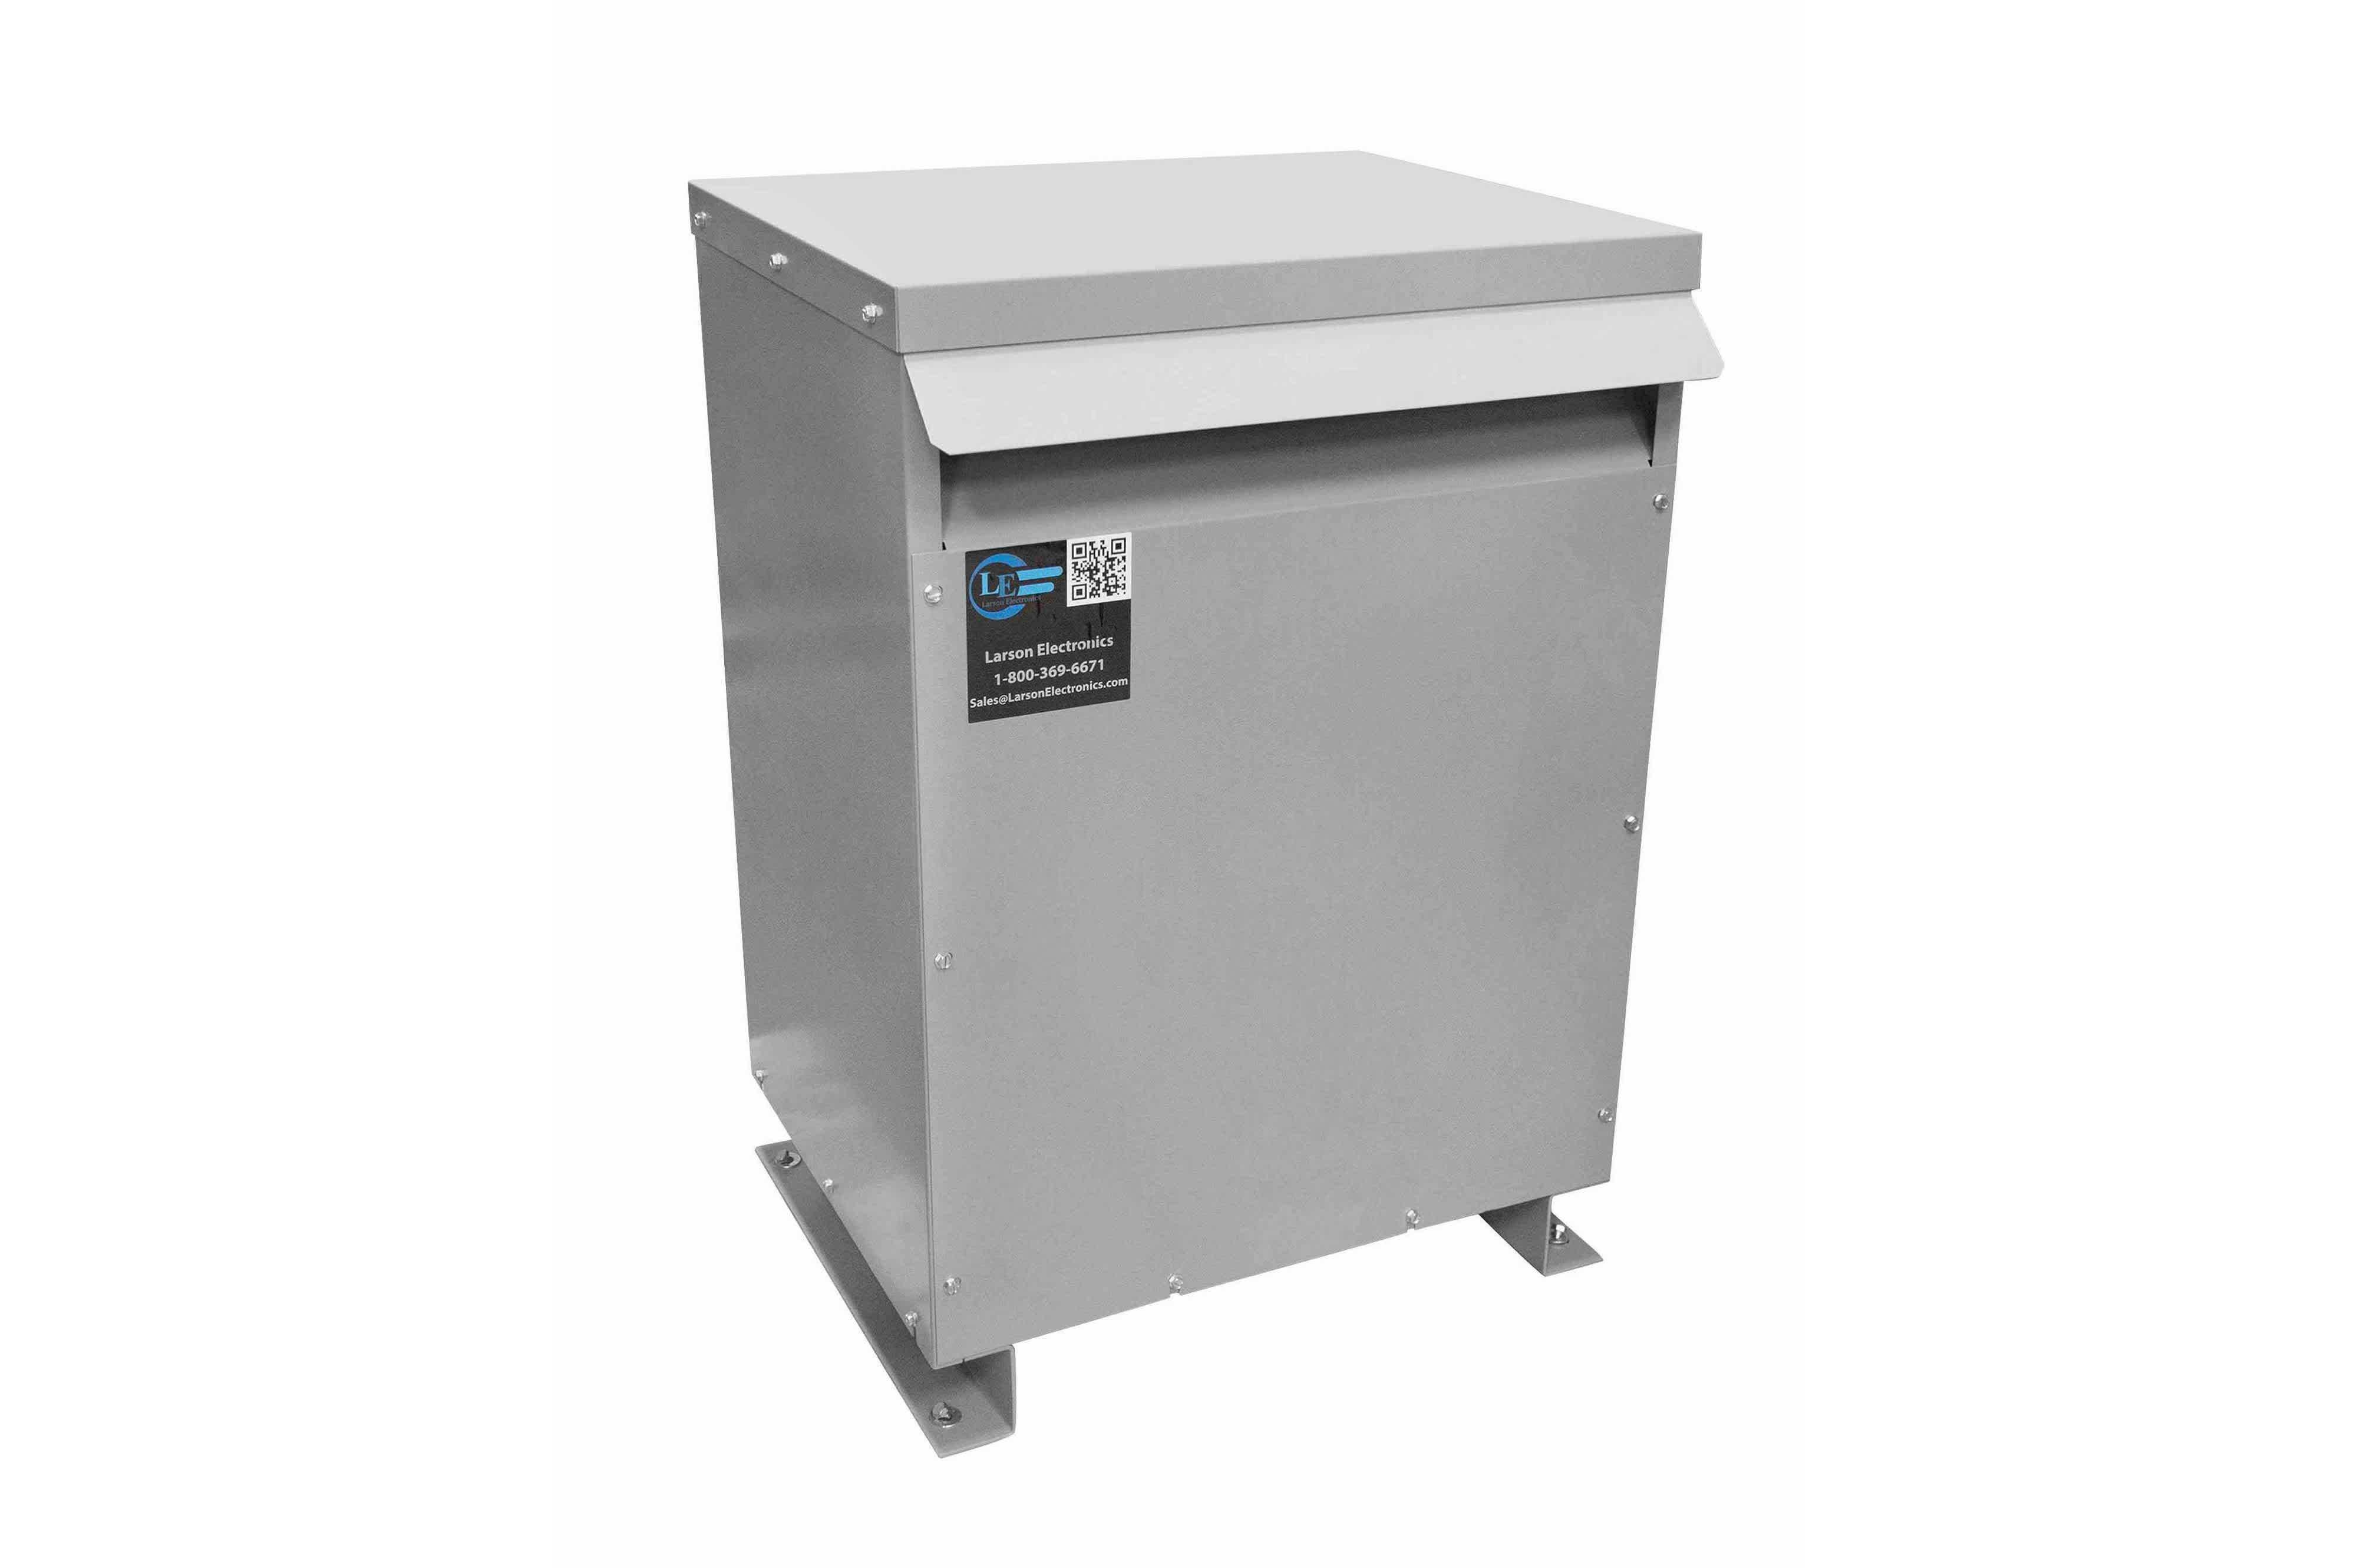 700 kVA 3PH Isolation Transformer, 220V Wye Primary, 480Y/277 Wye-N Secondary, N3R, Ventilated, 60 Hz